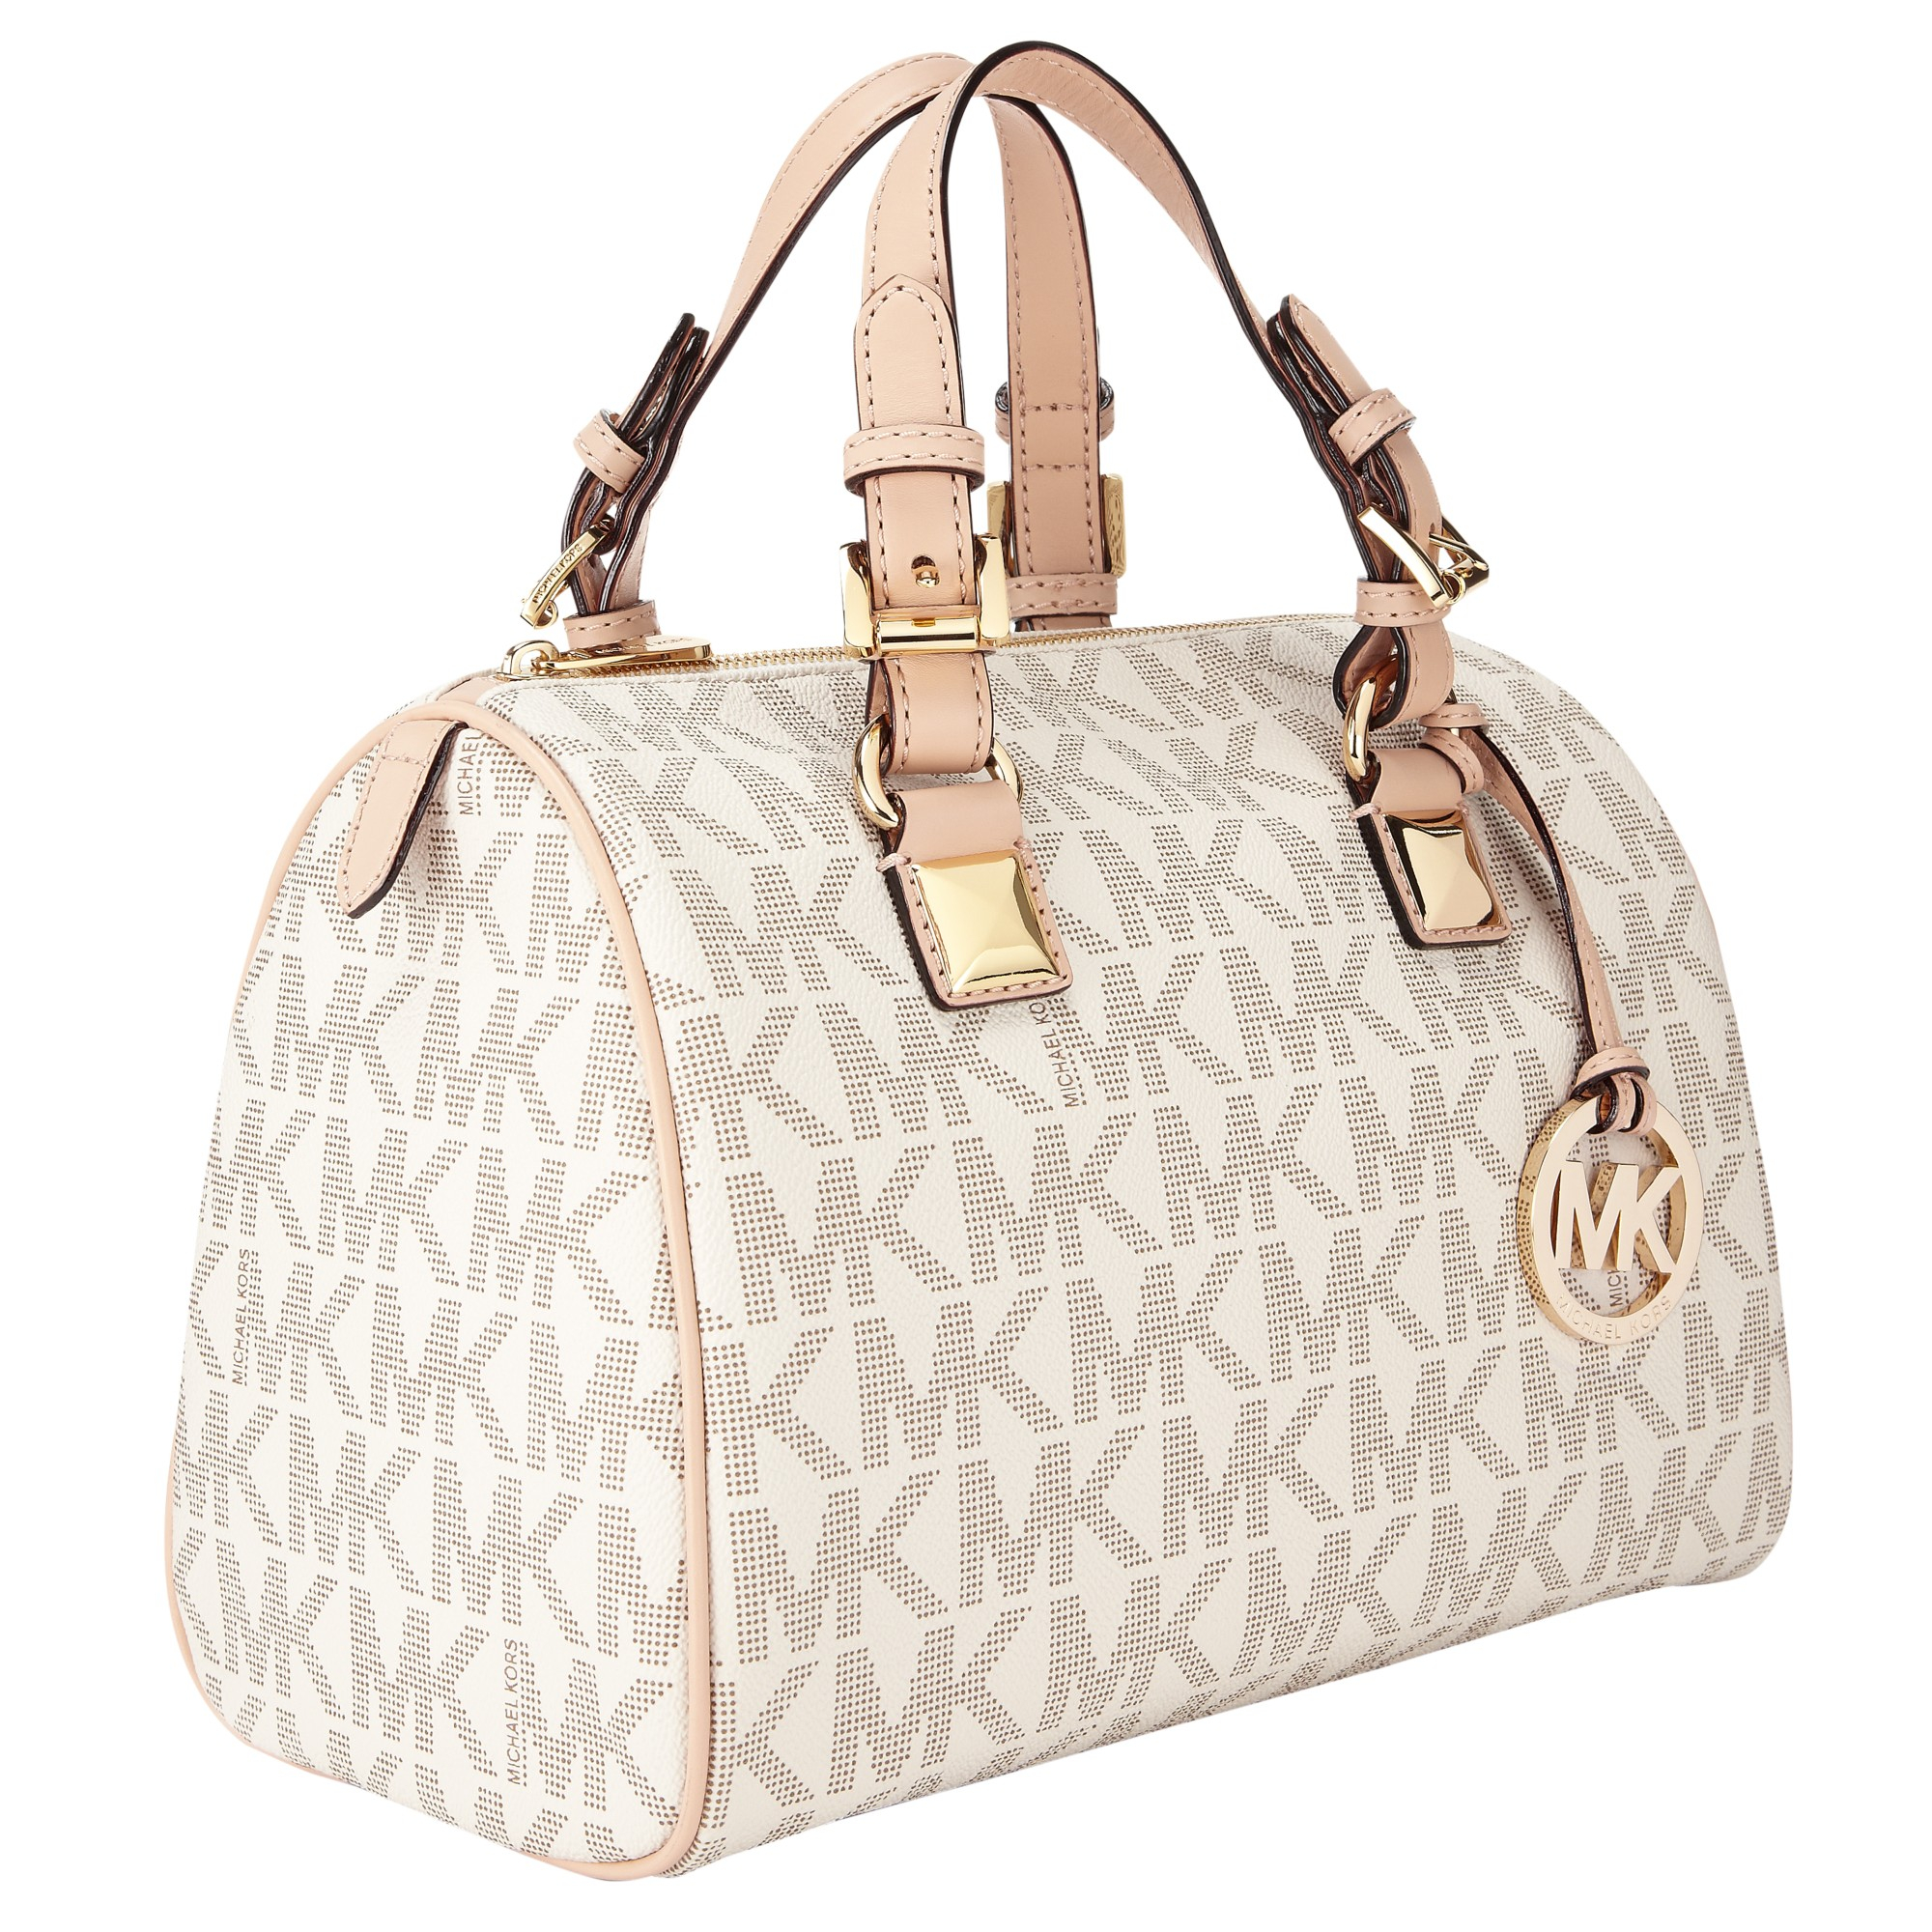 608ee5a33854 new zealand michael kors handbags john lewis best handbag 2017 d3fda c10f9